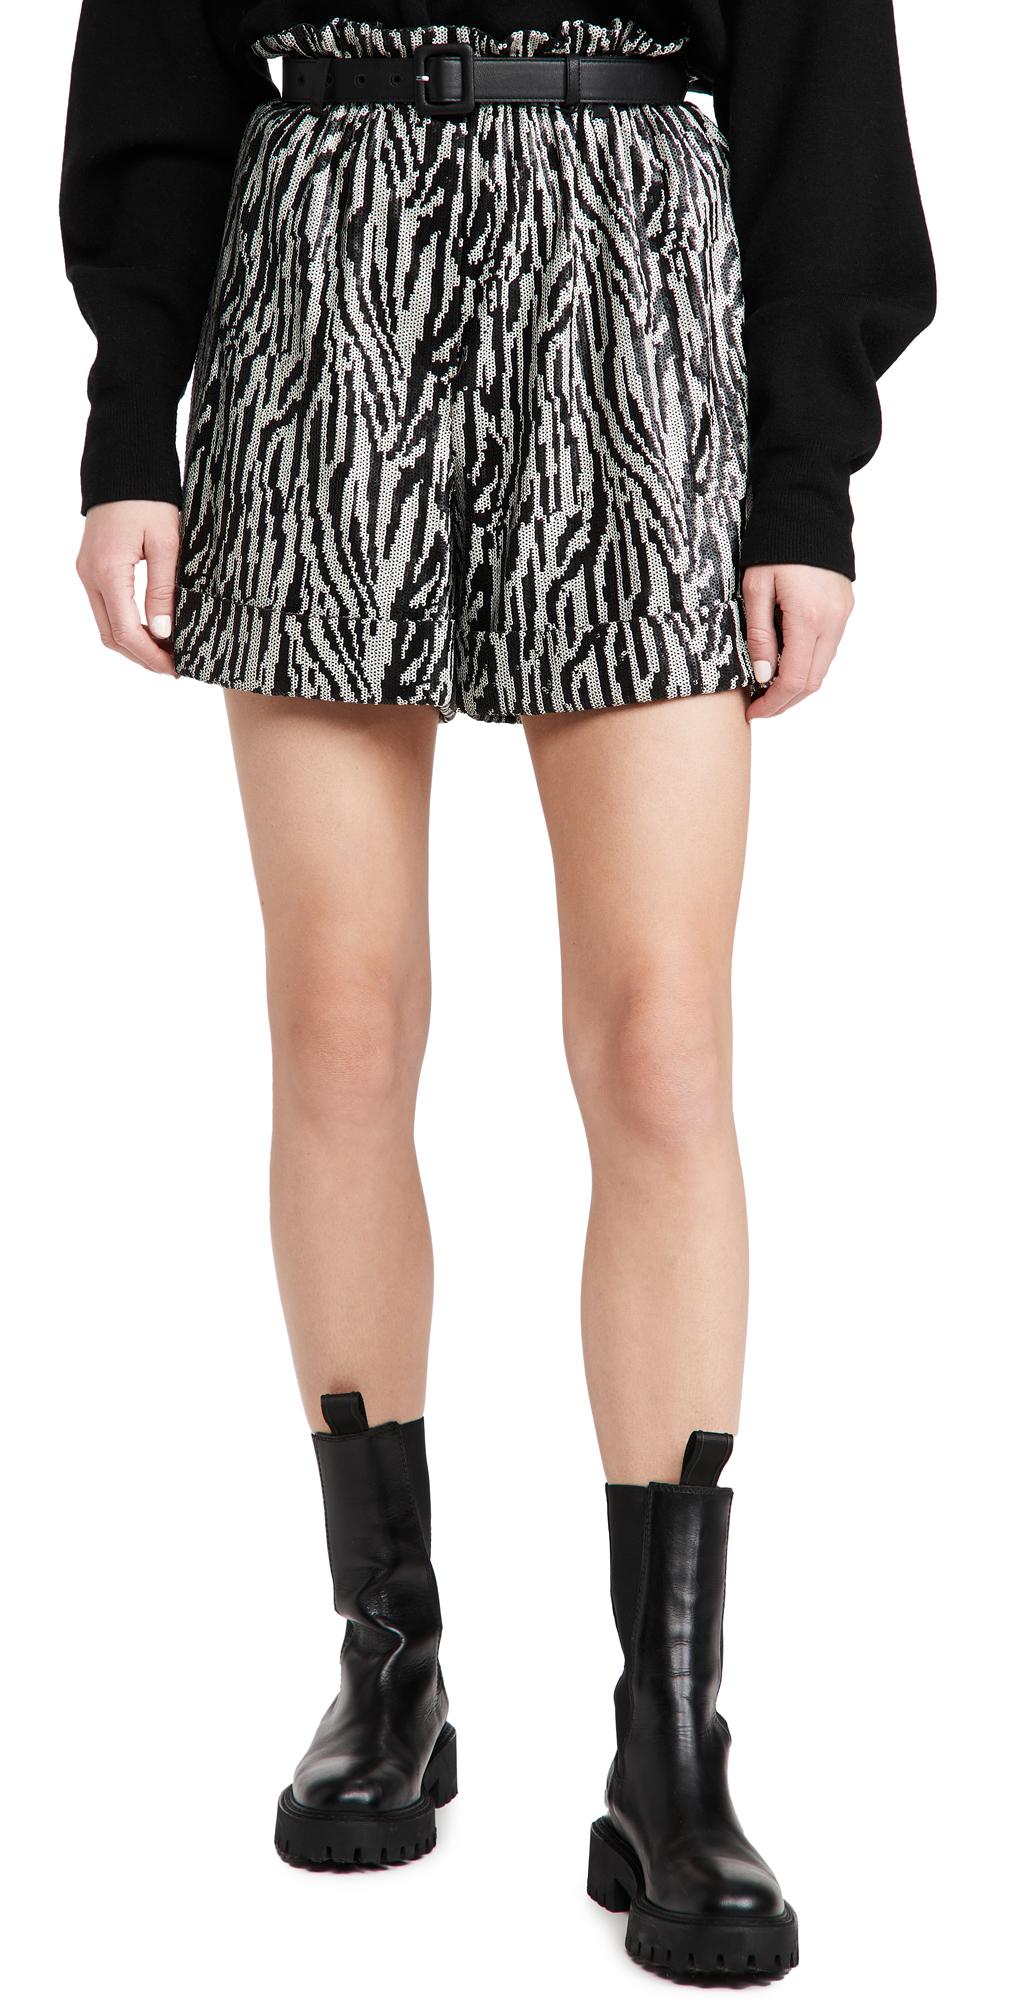 Self Portrait Zebra Sequin High Waisted Shorts